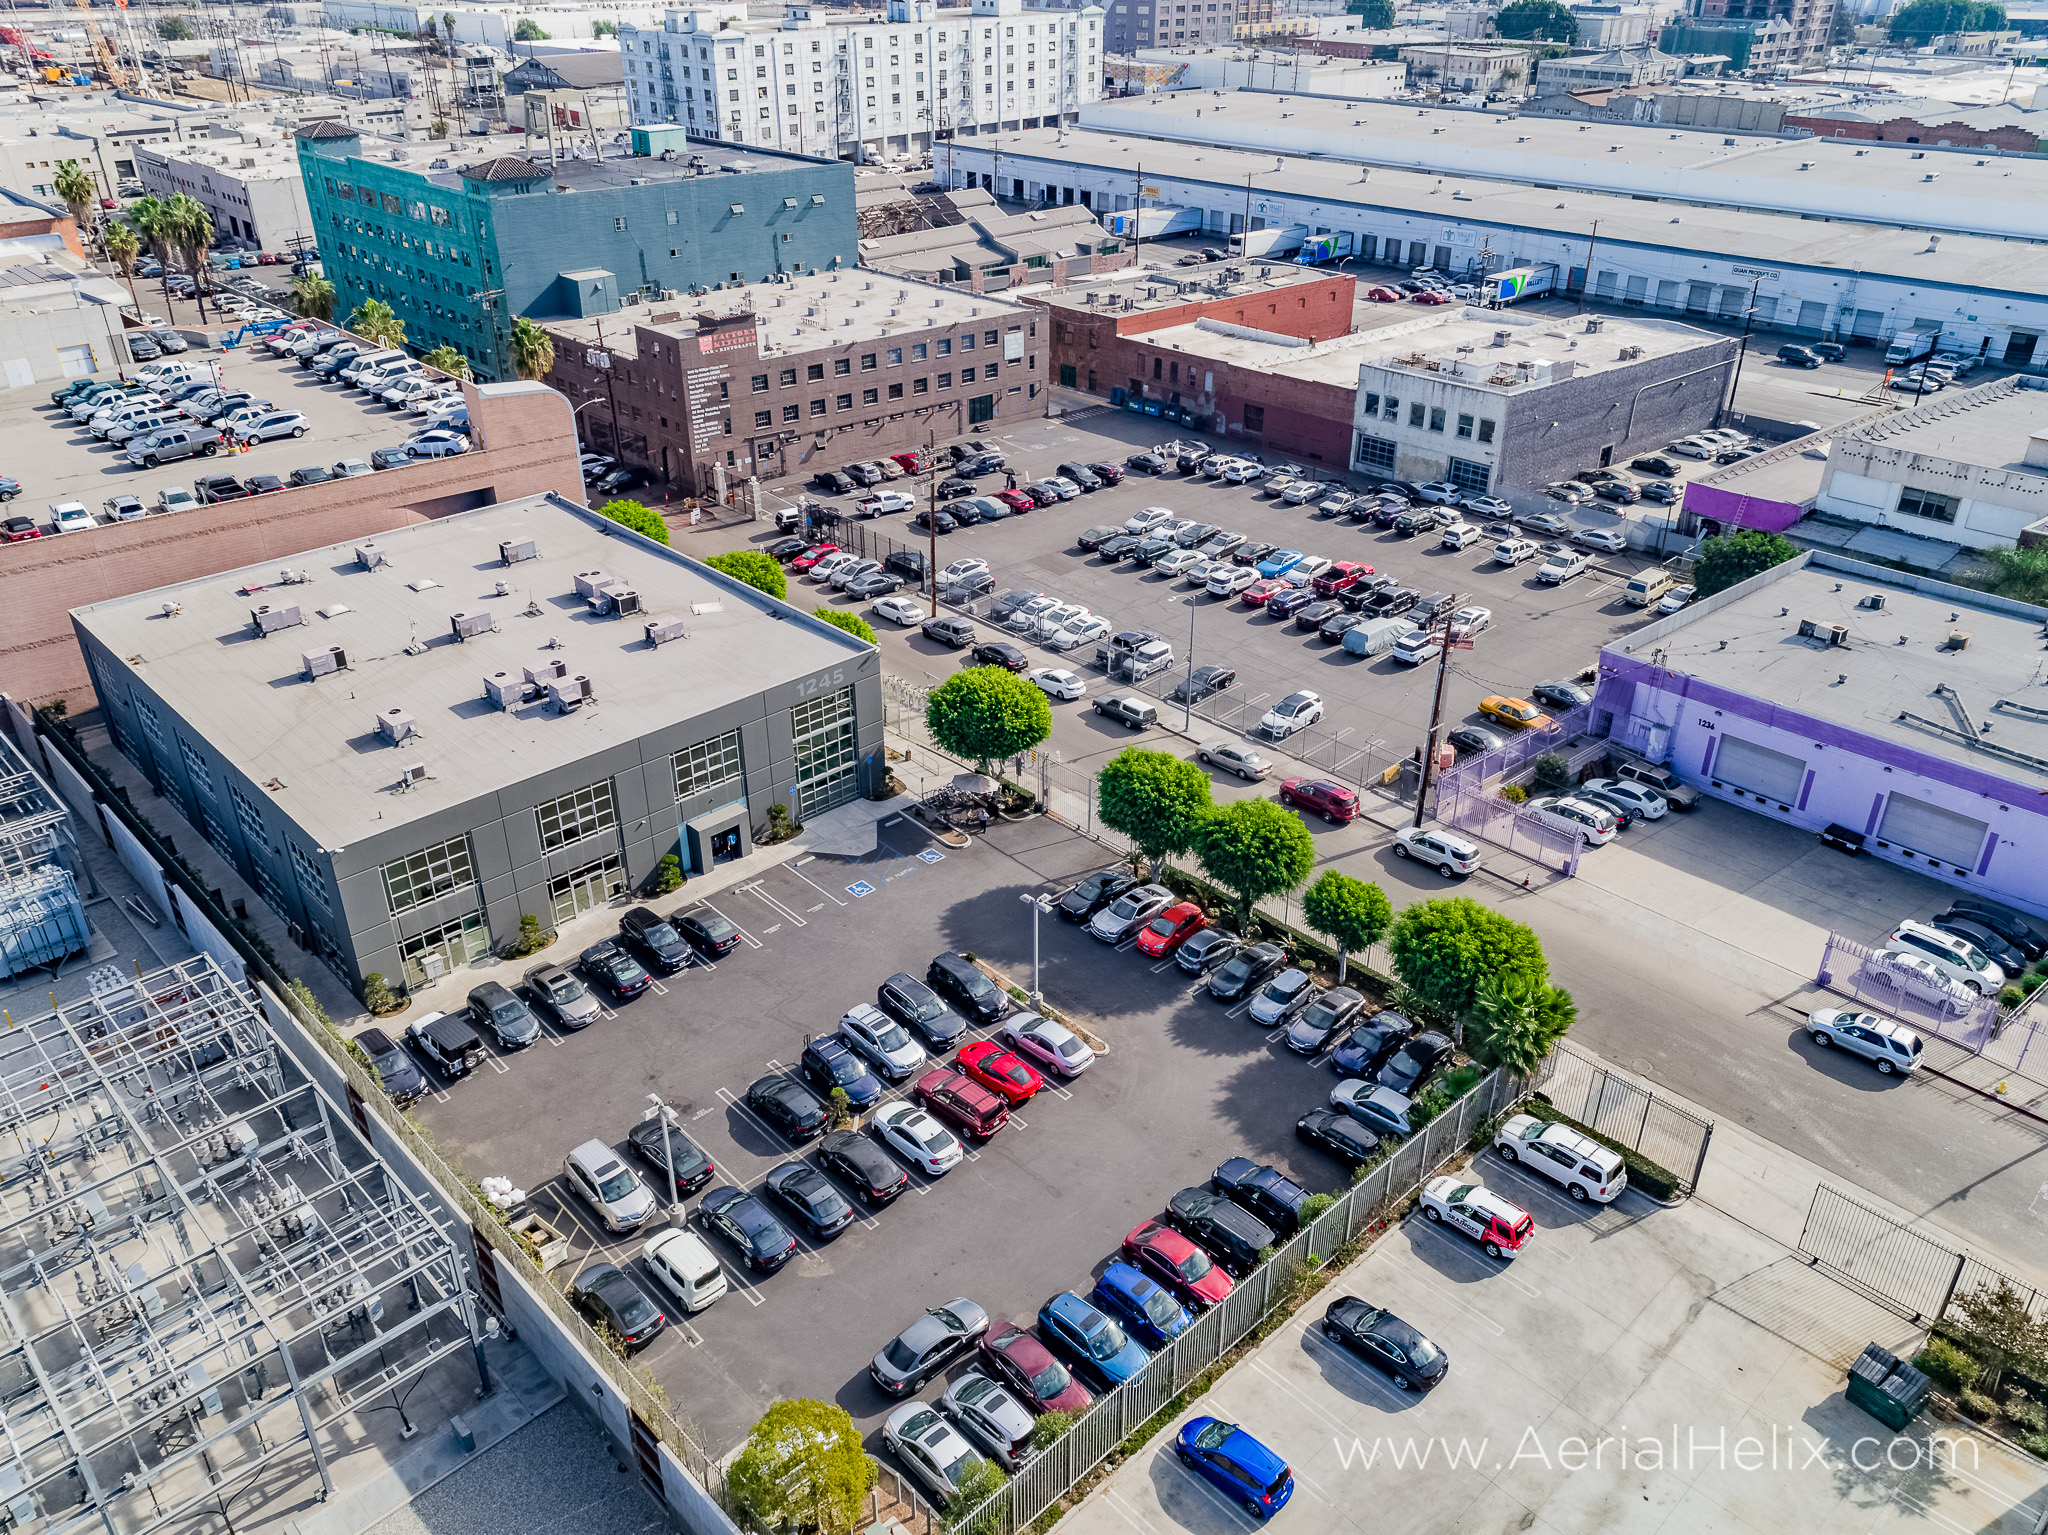 Perfect Parking 2 aerial photographer-42.jpg